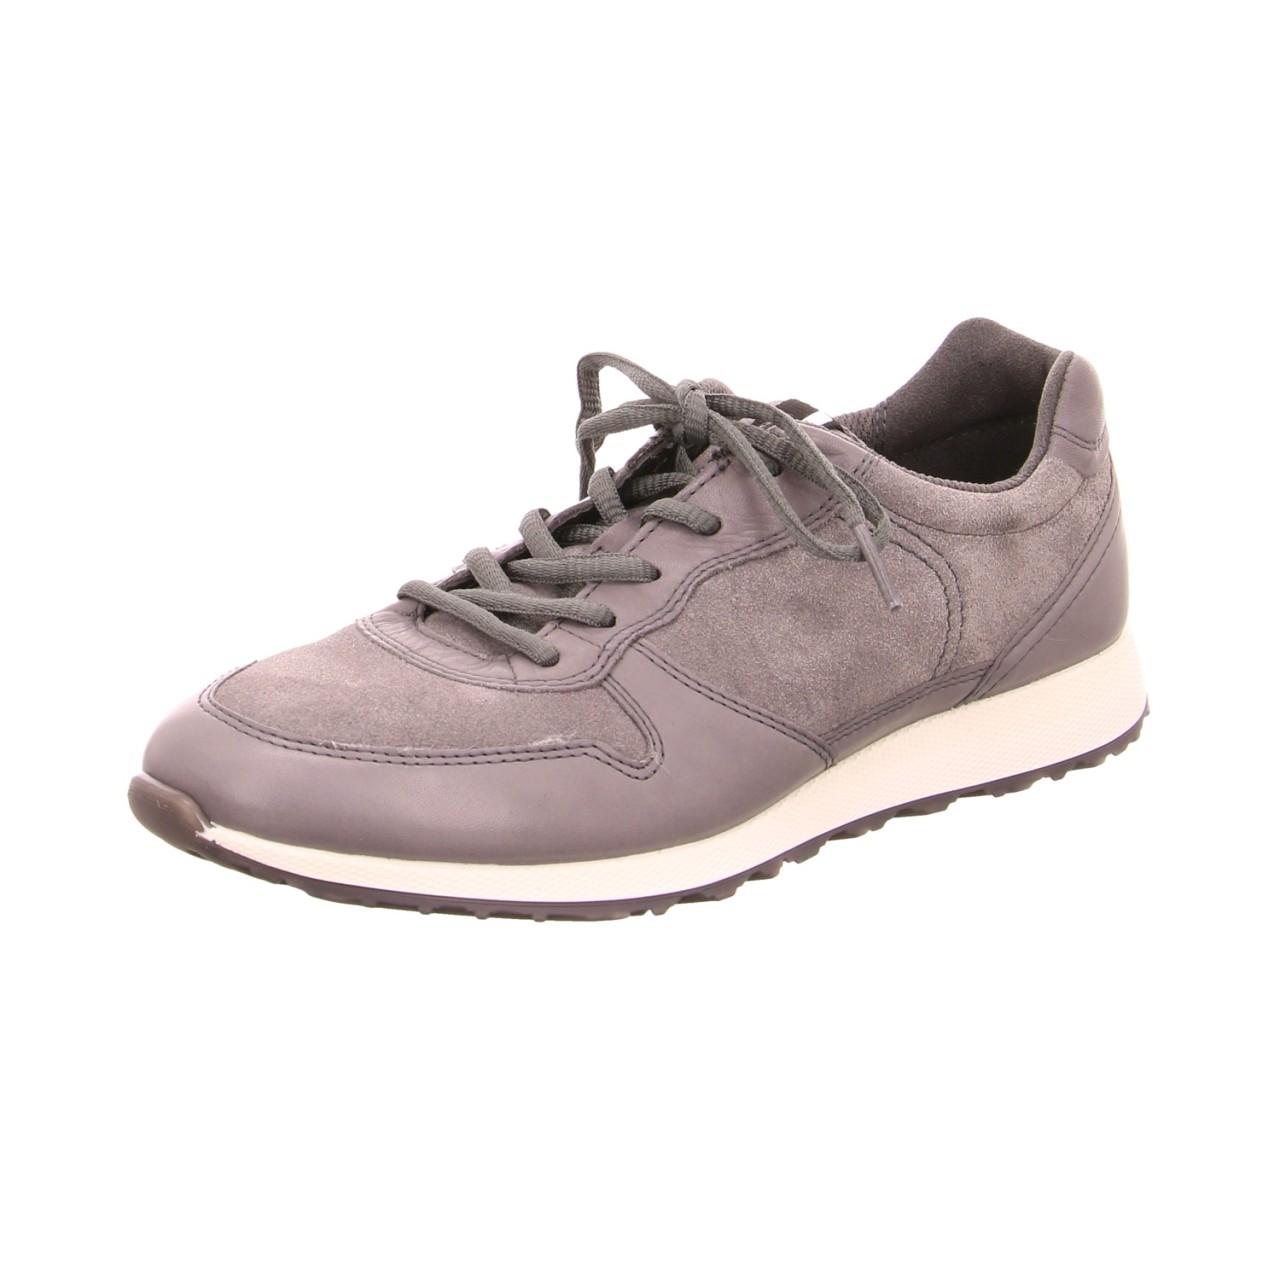 Ecco Sneaker grau grau